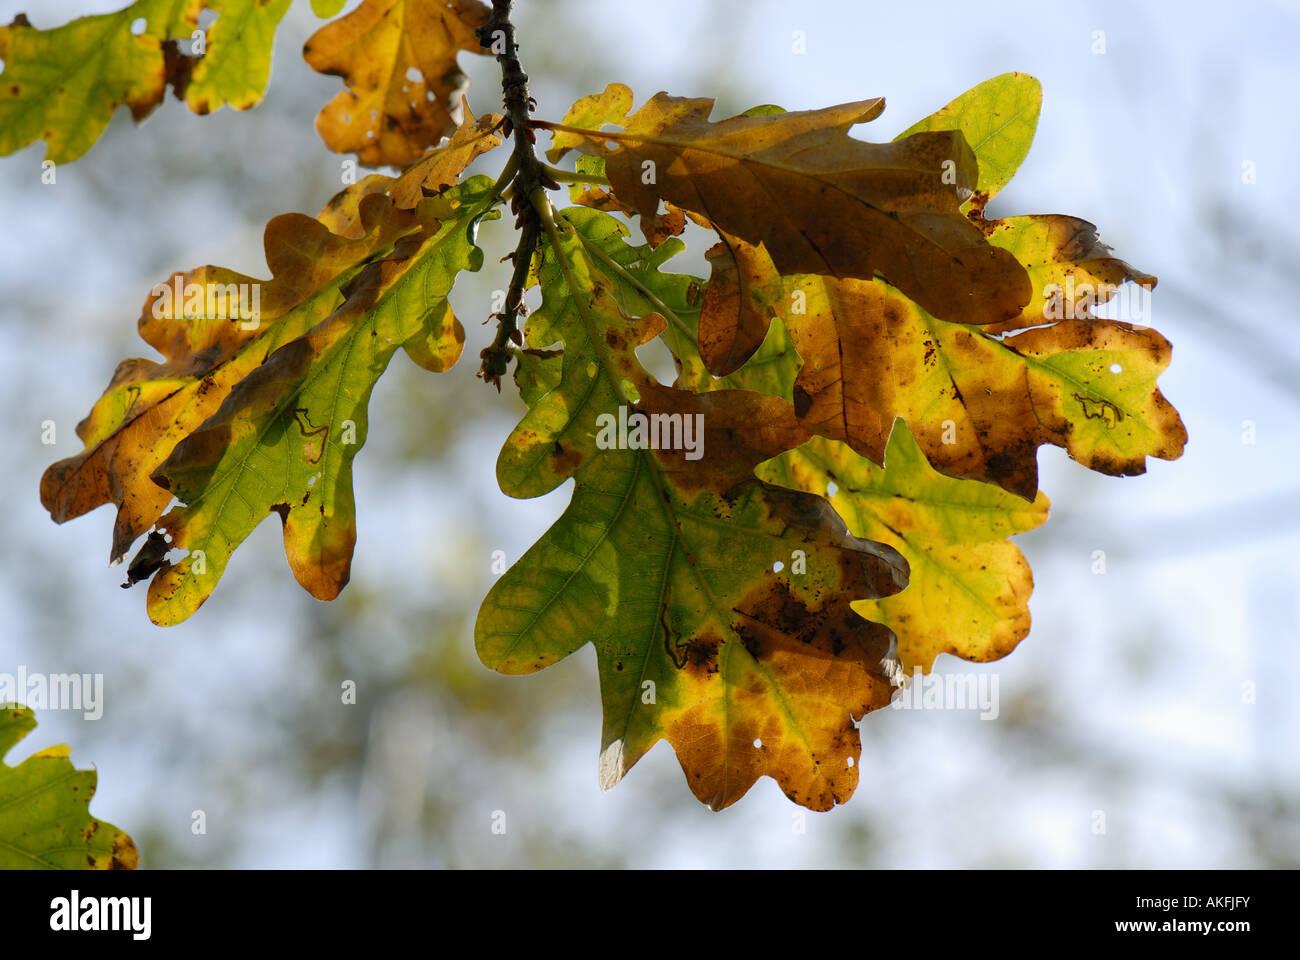 Oak Quercus robur leaves changing colour in autumn - Stock Image